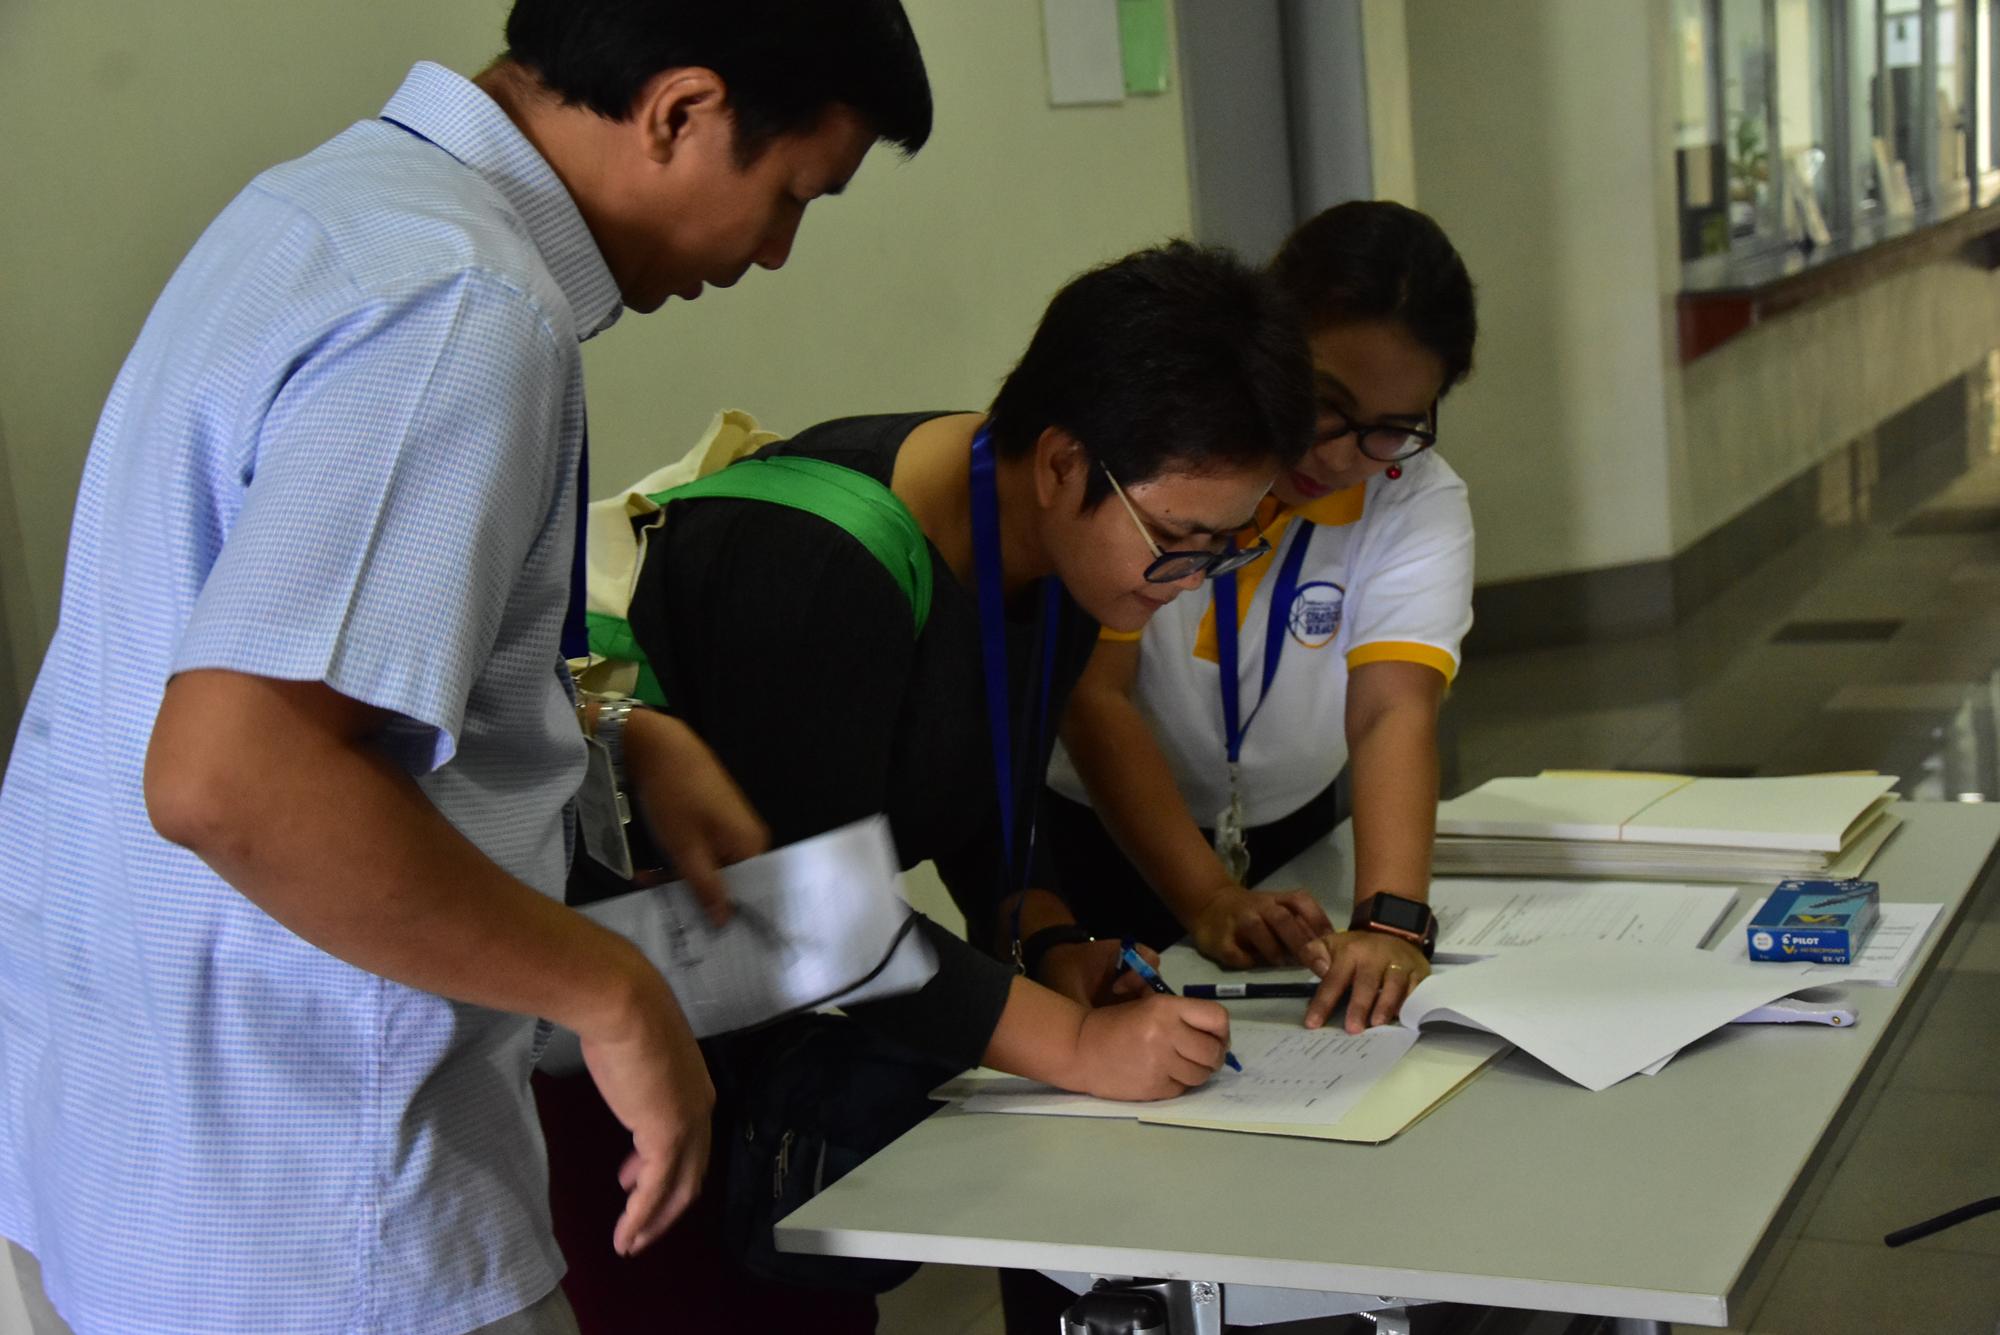 Ms. Villanueva, CSR Program Coordinator assisting during registration